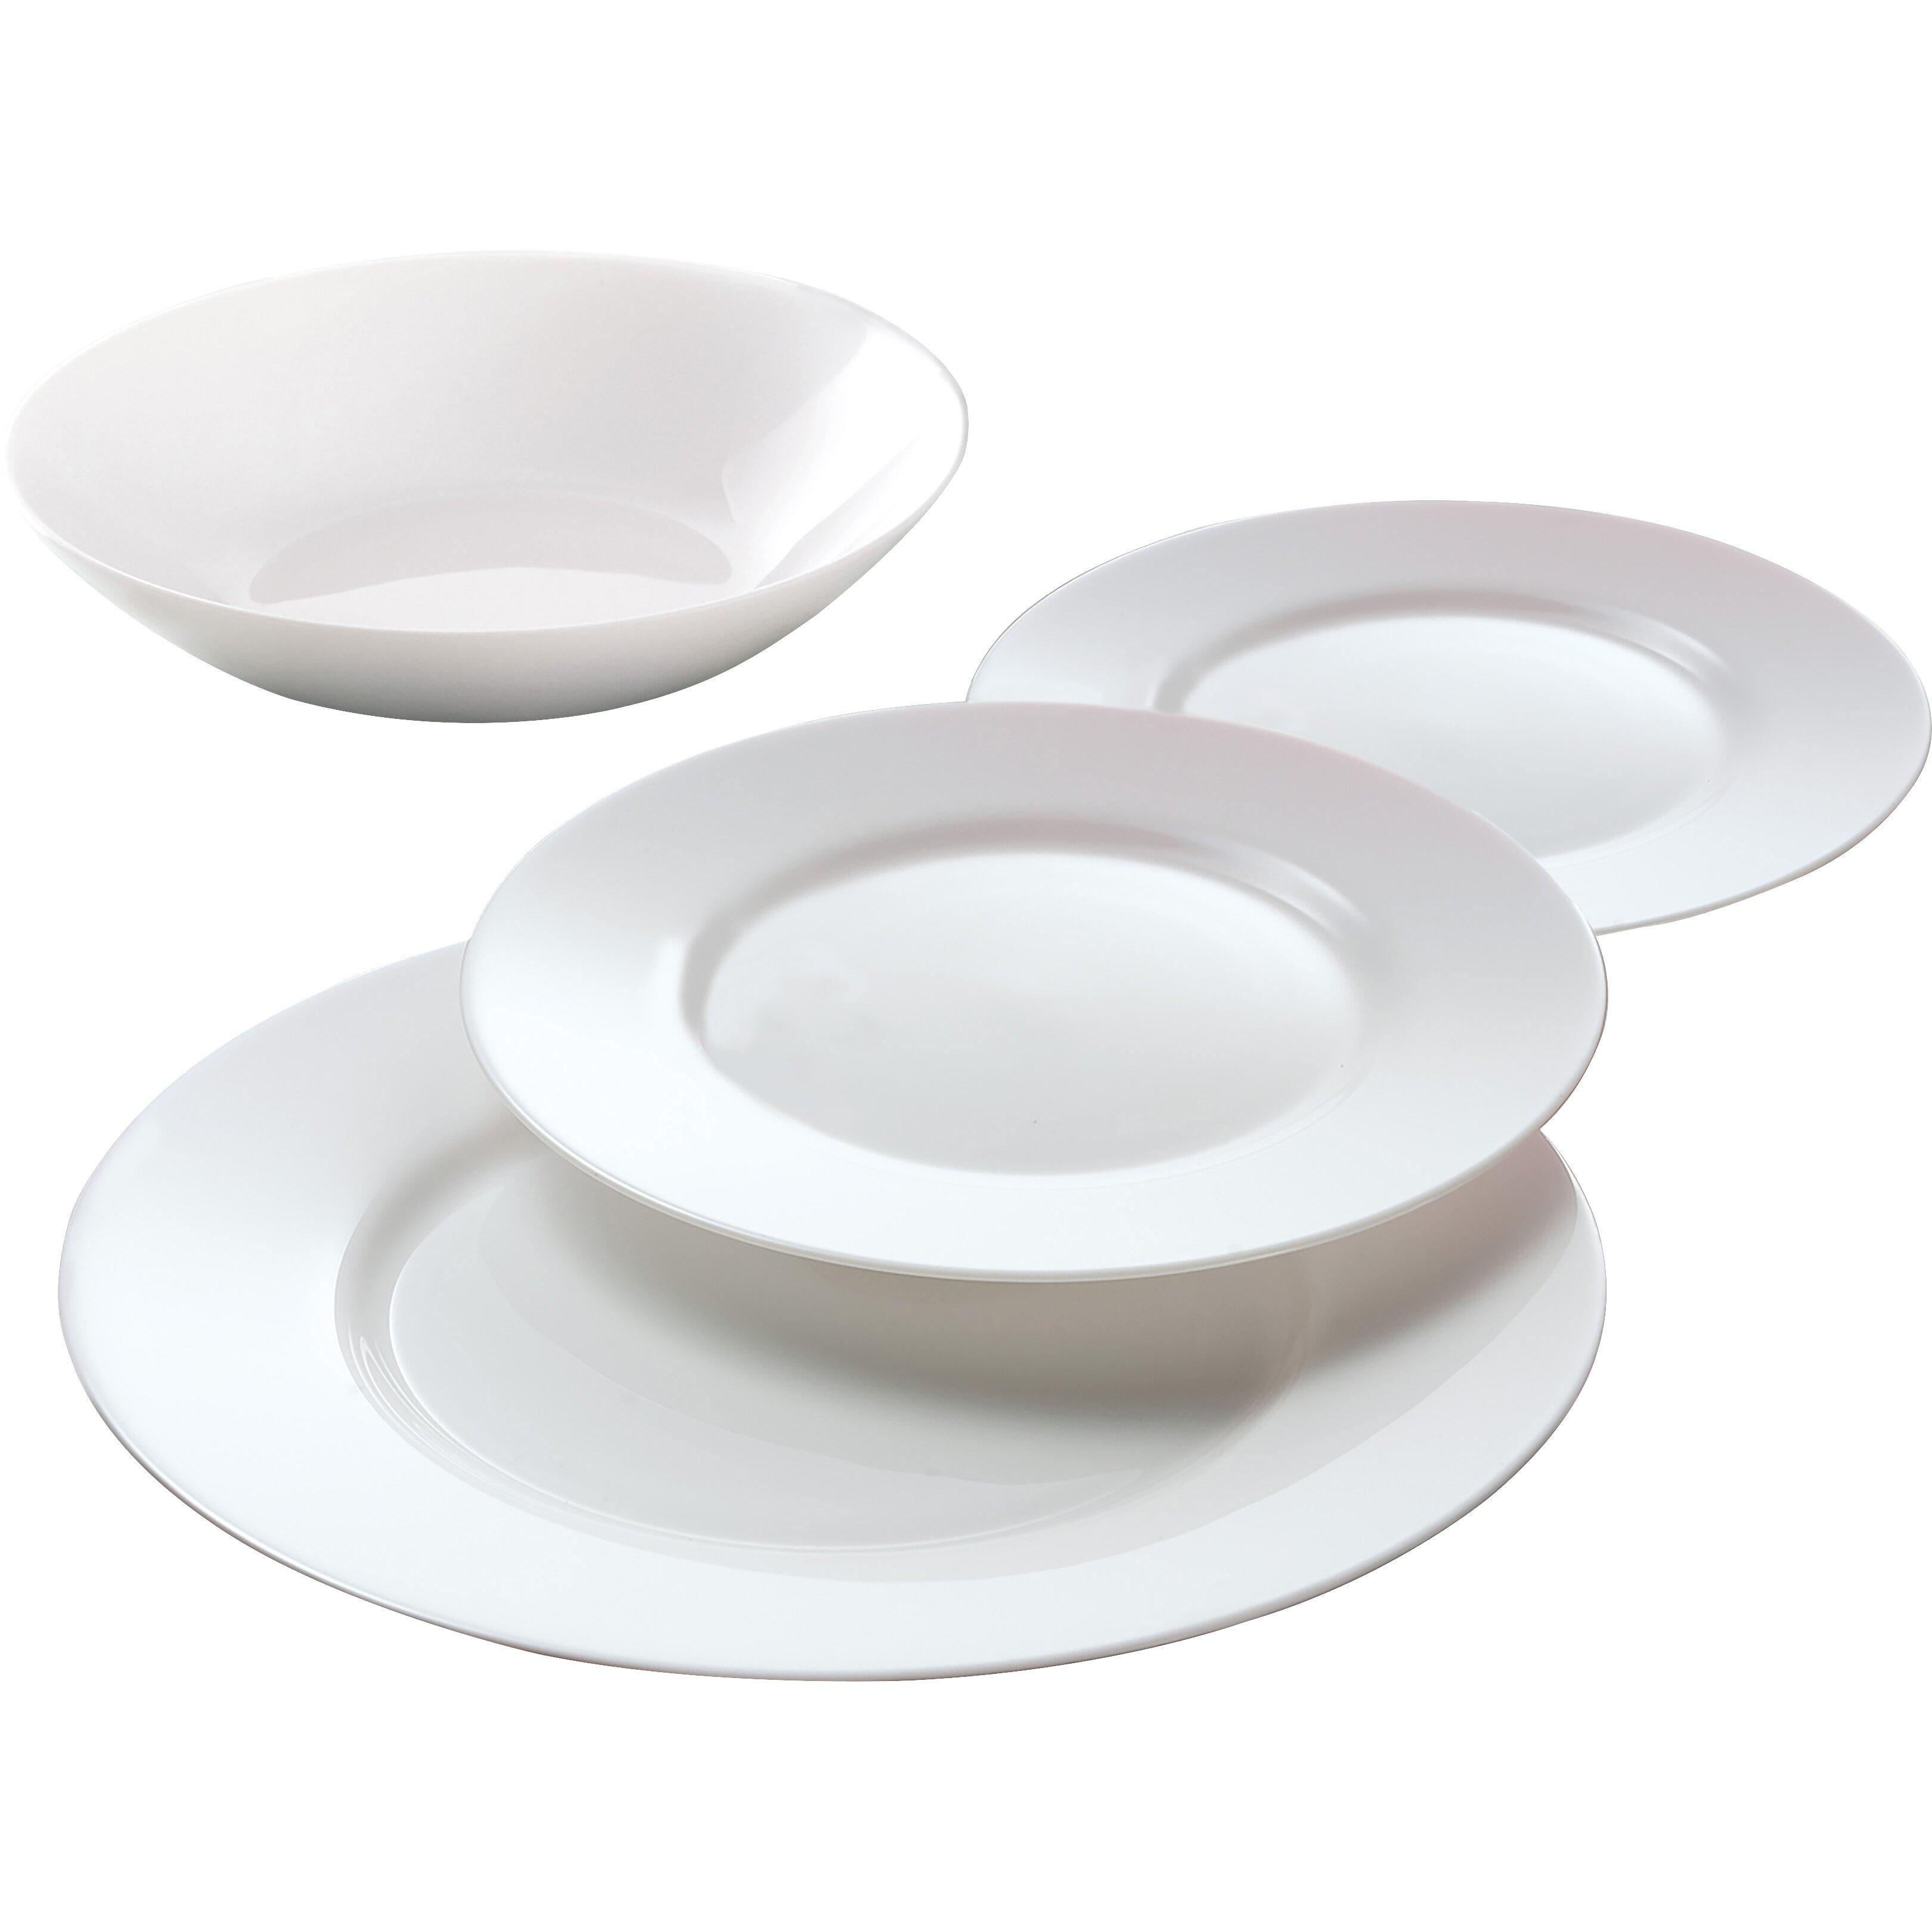 Luminarc Everyday 12 Piece Dinnerware Set Amp Reviews